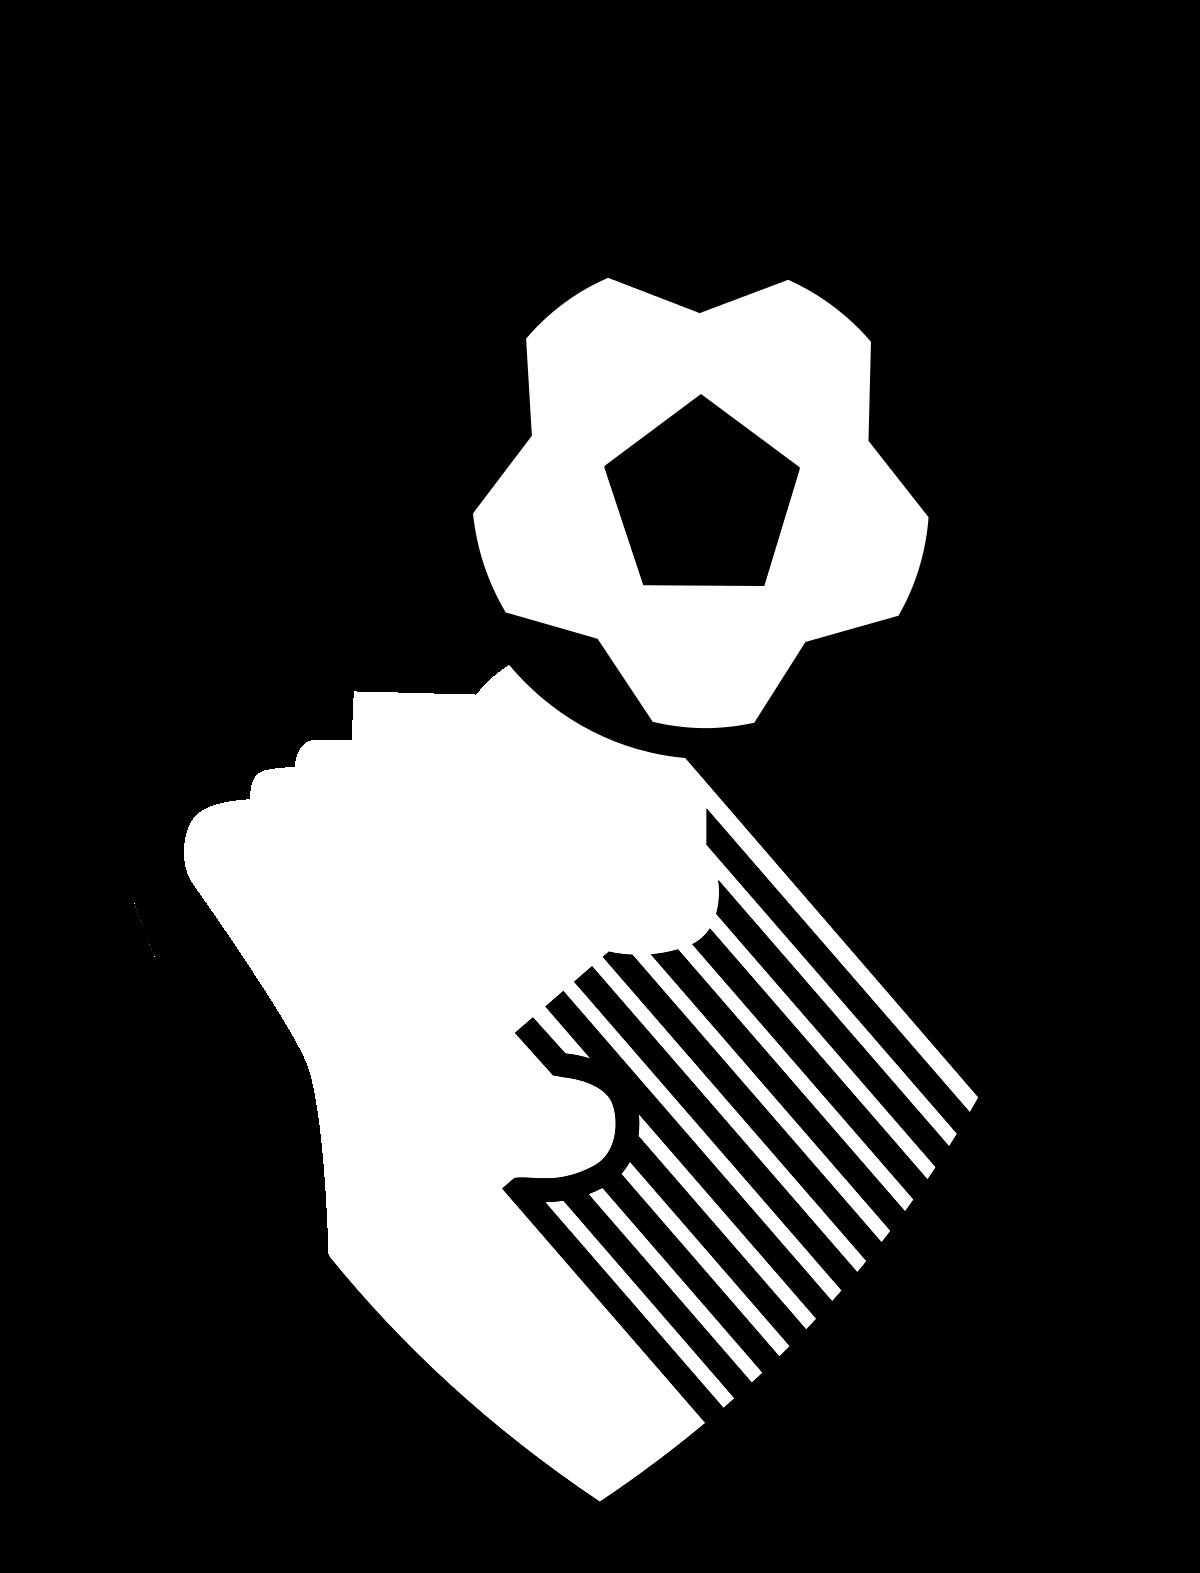 Logo Bournemouth Fc Png - Logo Bournemouth Fc Png Hdpng.com 1200, Transparent background PNG HD thumbnail